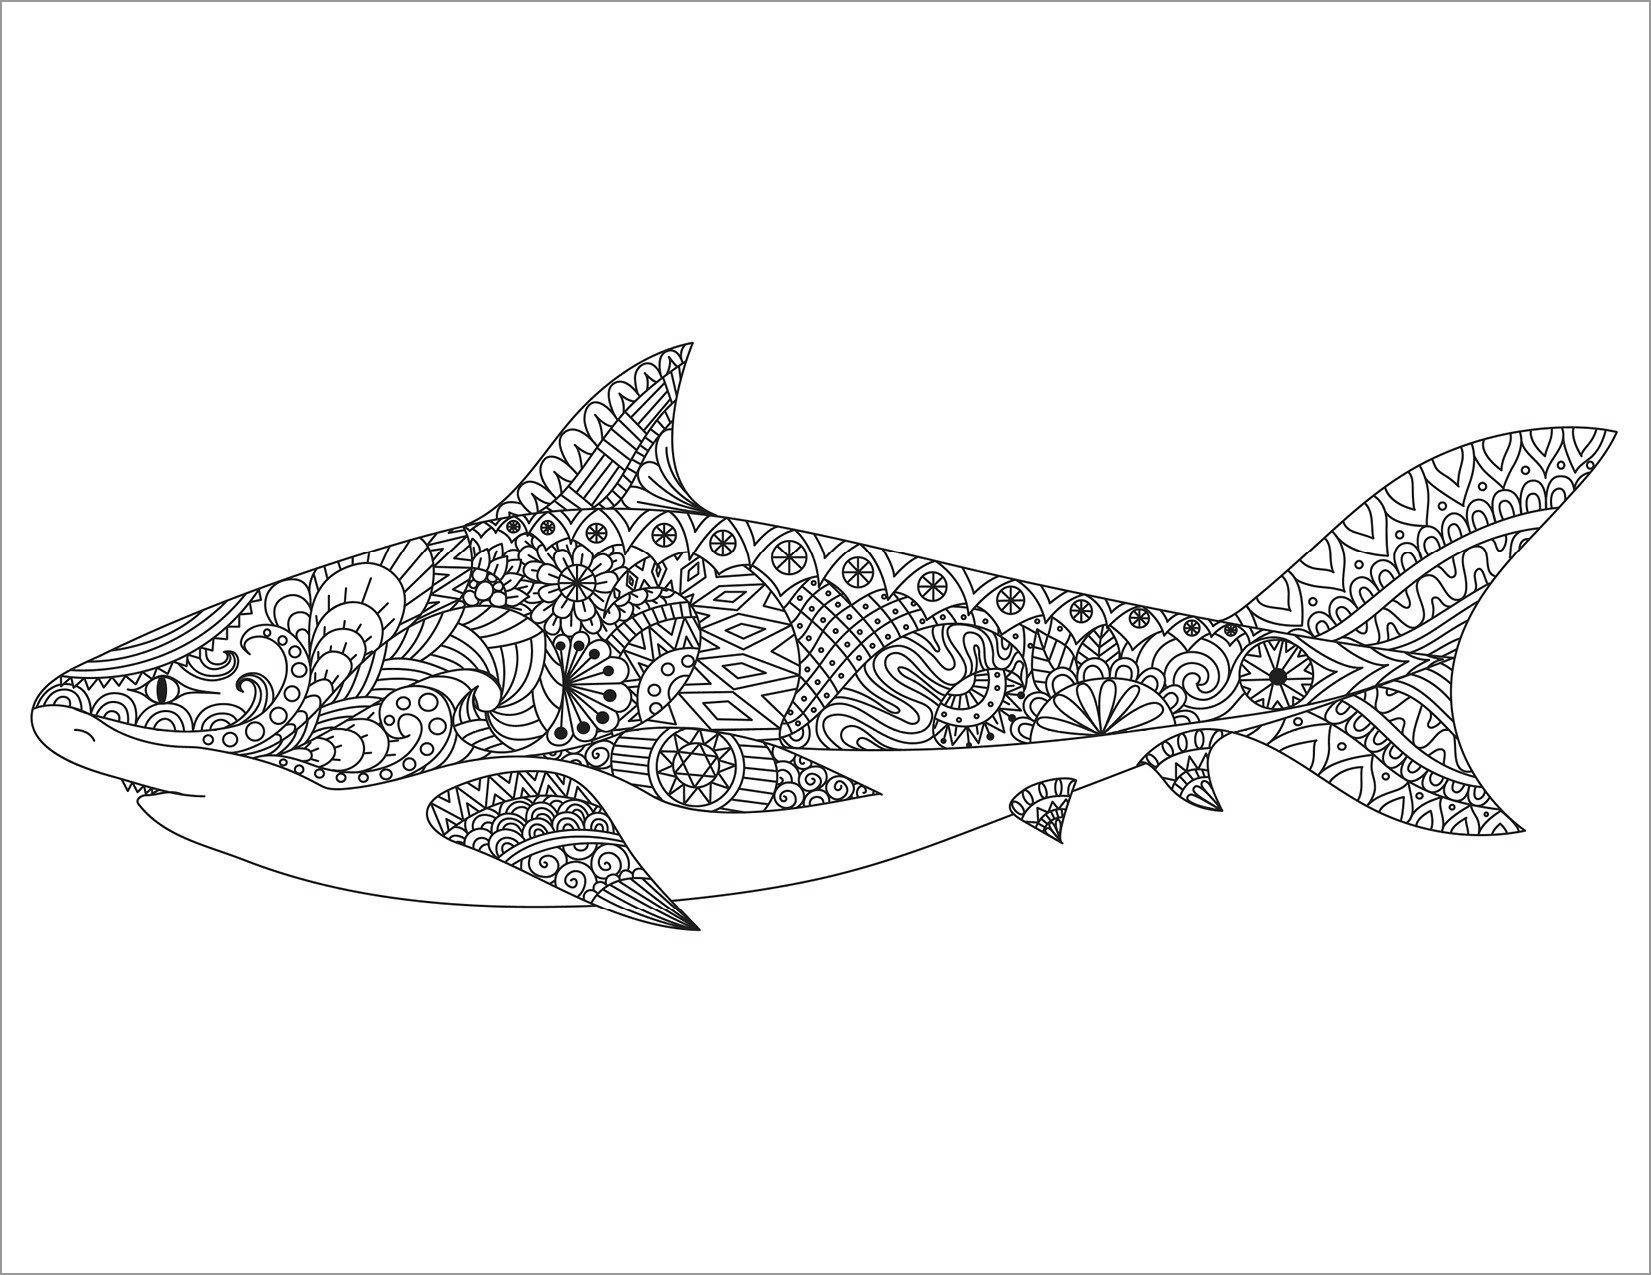 Zentangle Mandala Shark Coloring Page for Adult